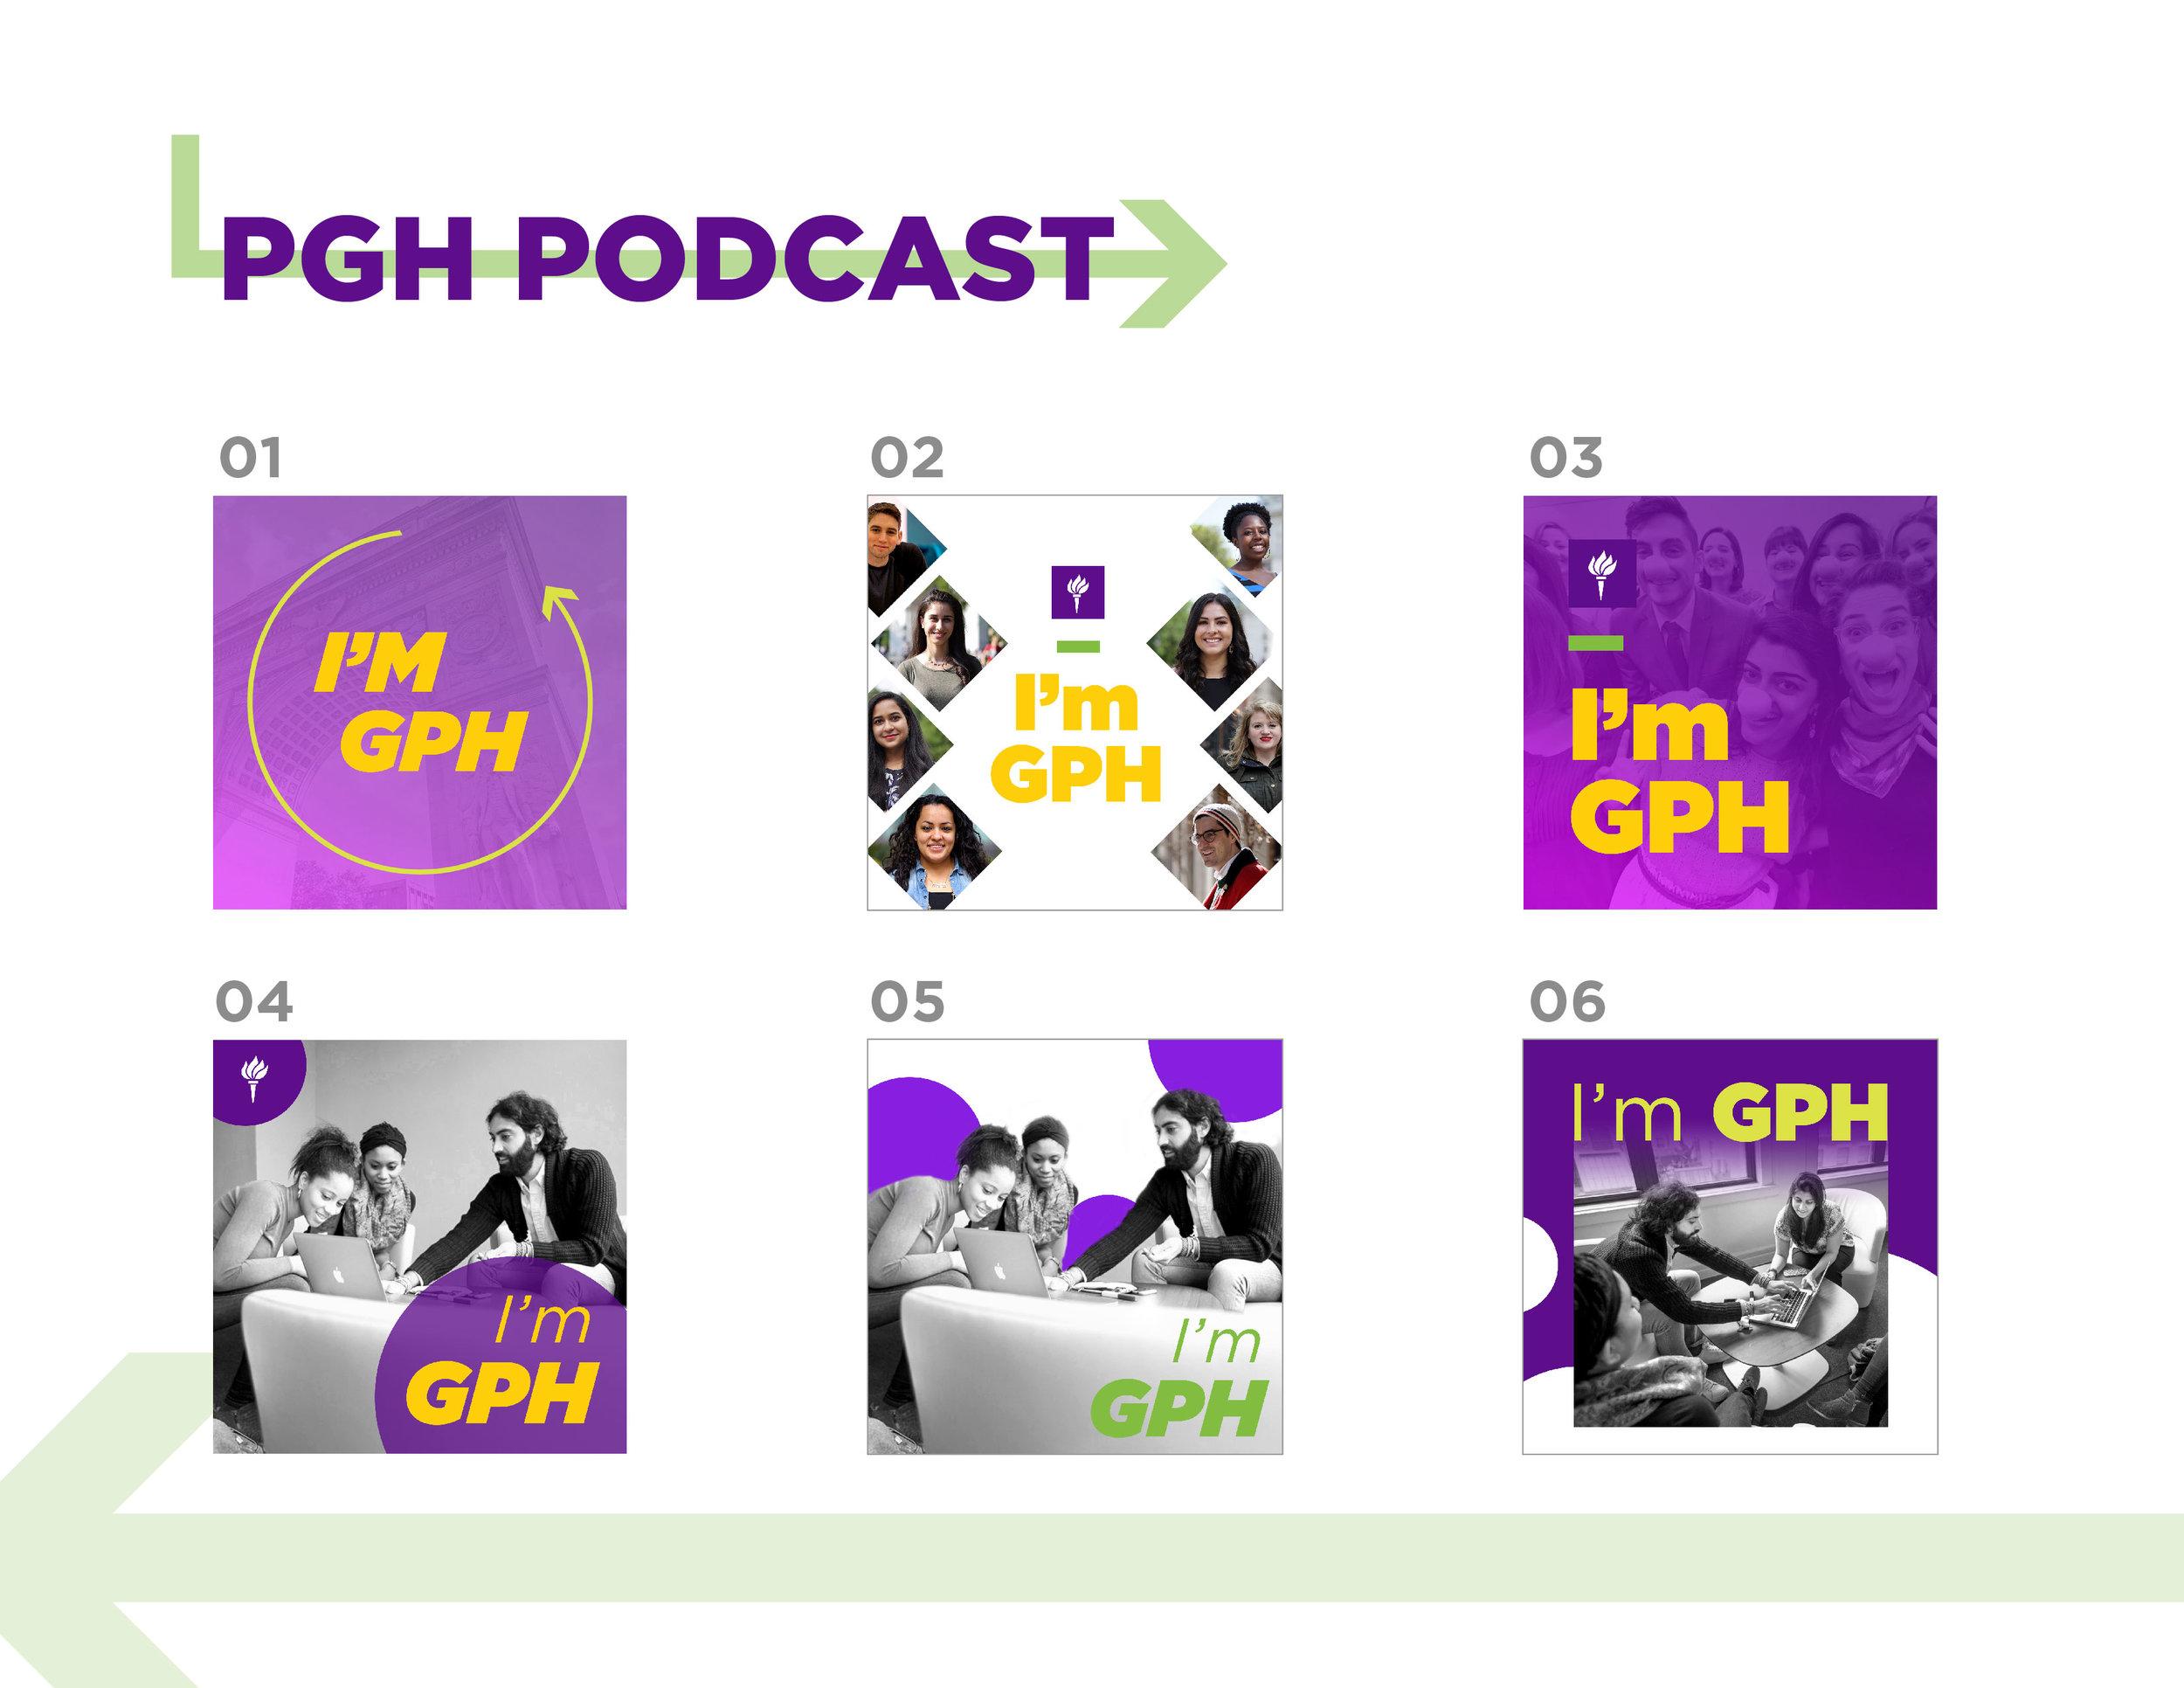 podcast-presentation-01.jpg